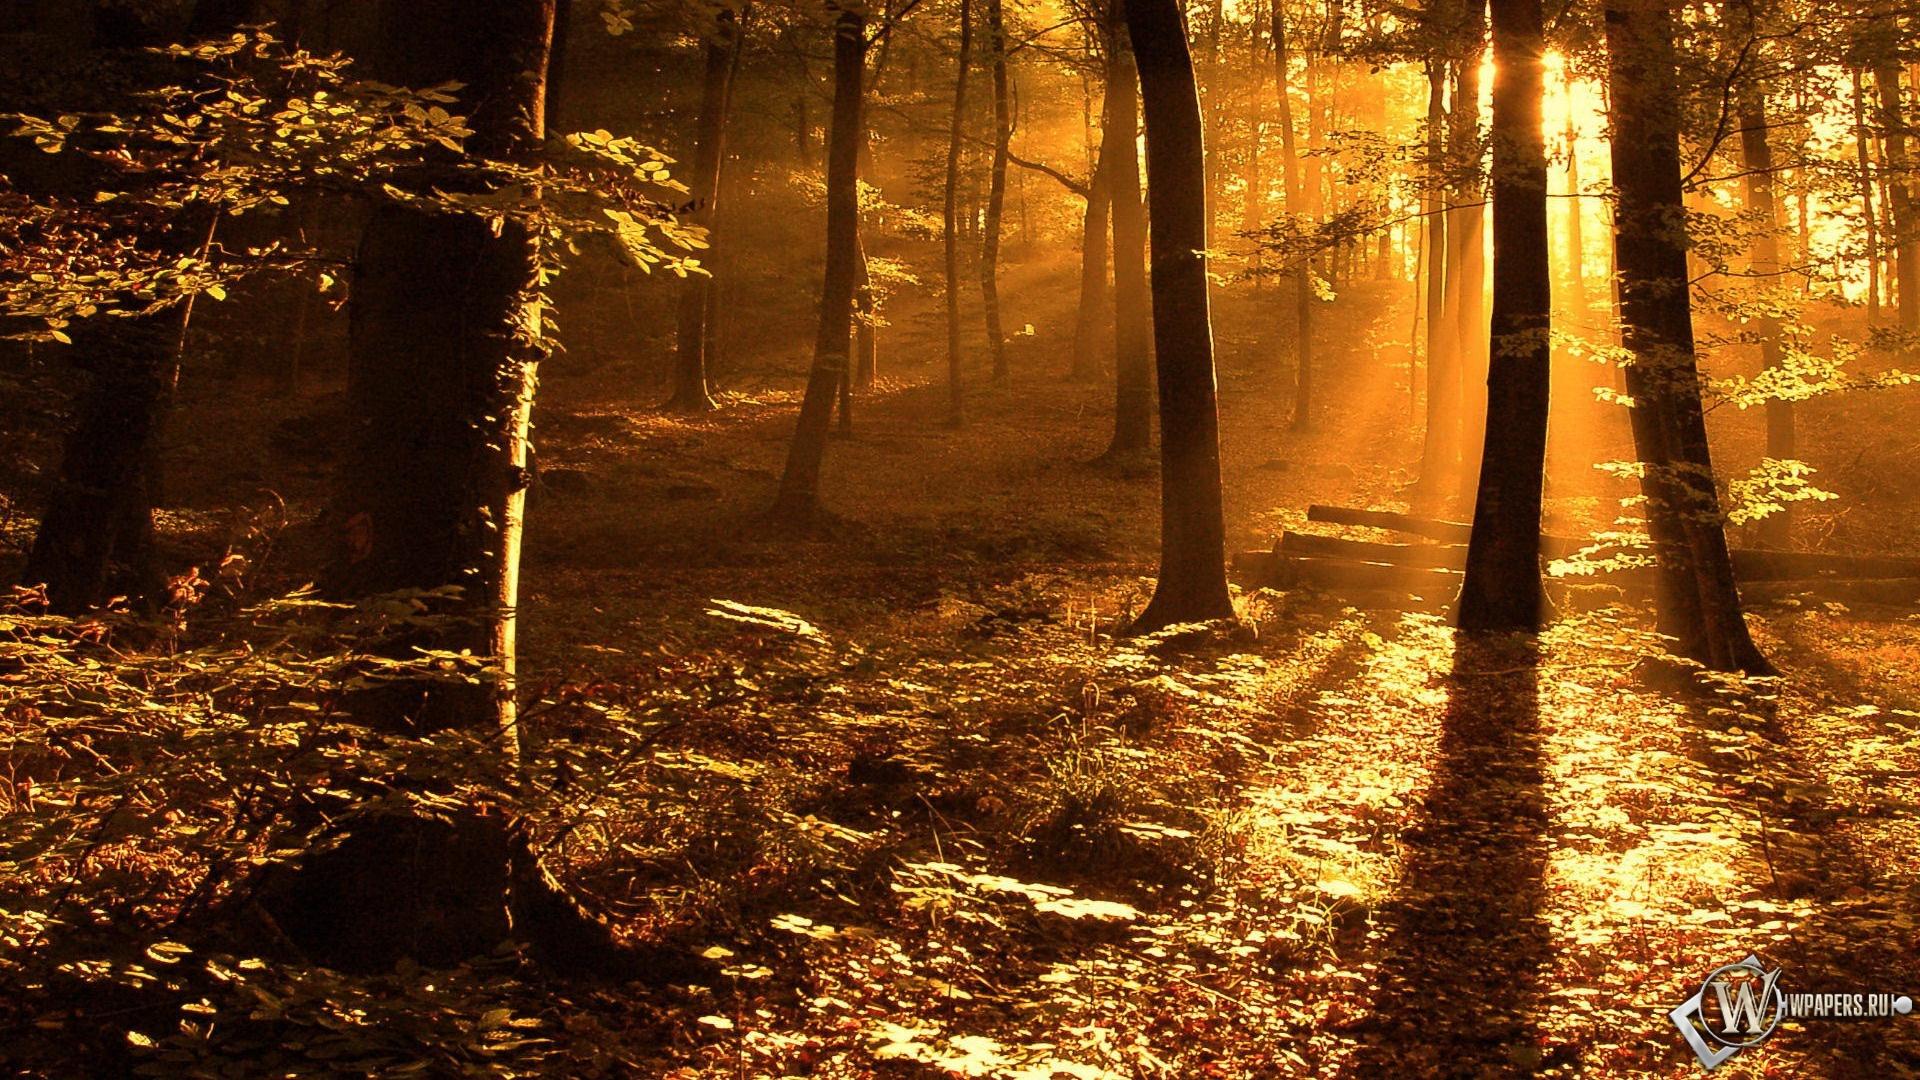 Обои, Свет в лесу, Свет, Лес, Деревья ...: wpapers.ru/wallpapers/nature/Autumn/7378/1920-1080_%C3%90%C2%A1%C3...